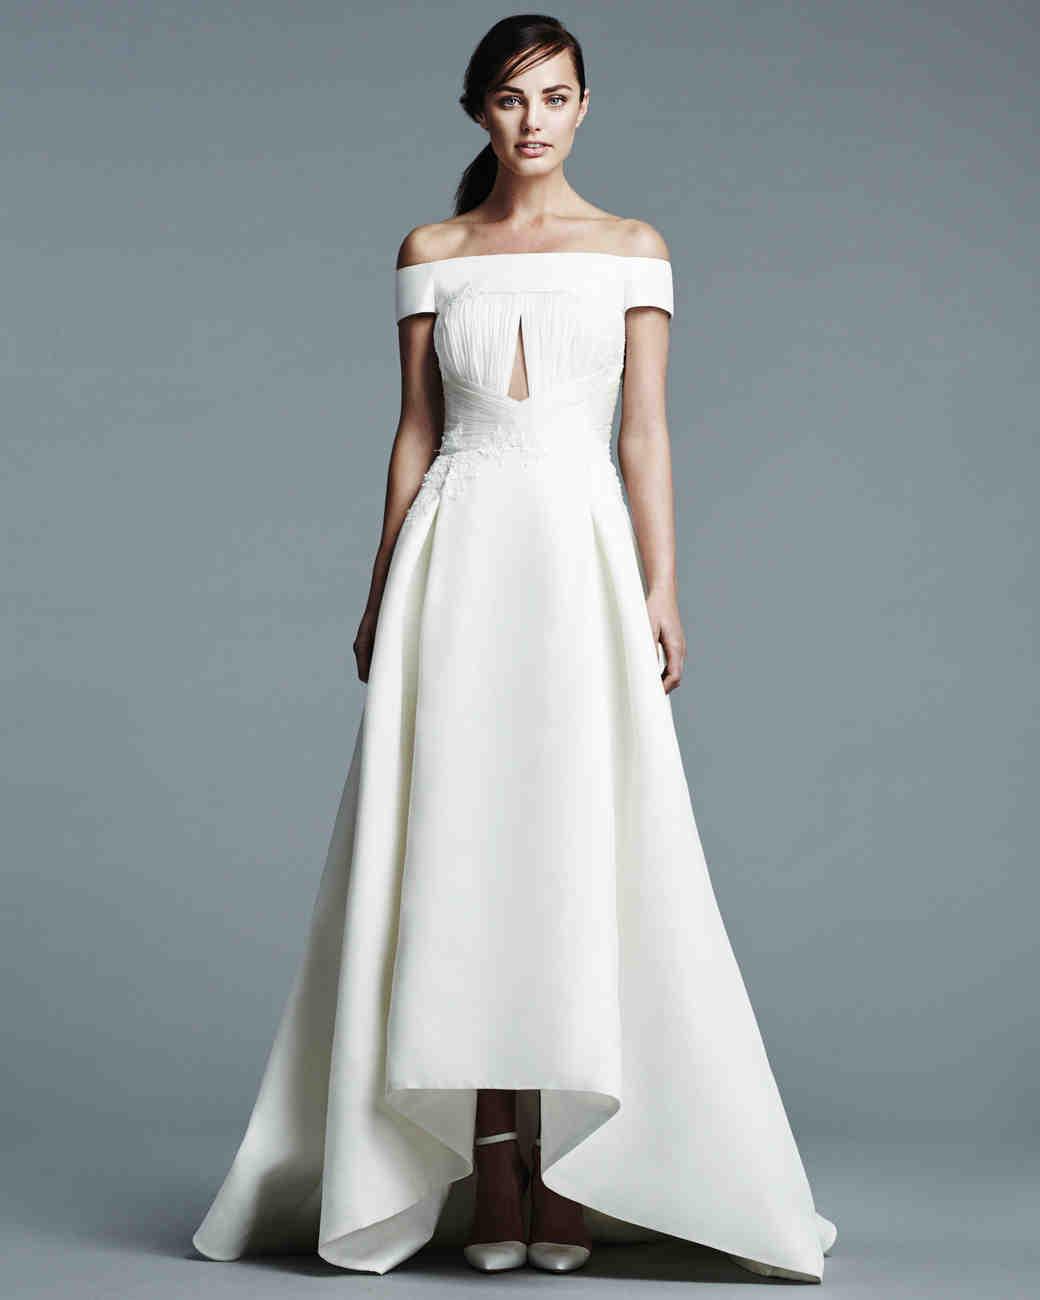 Sabrina style dress